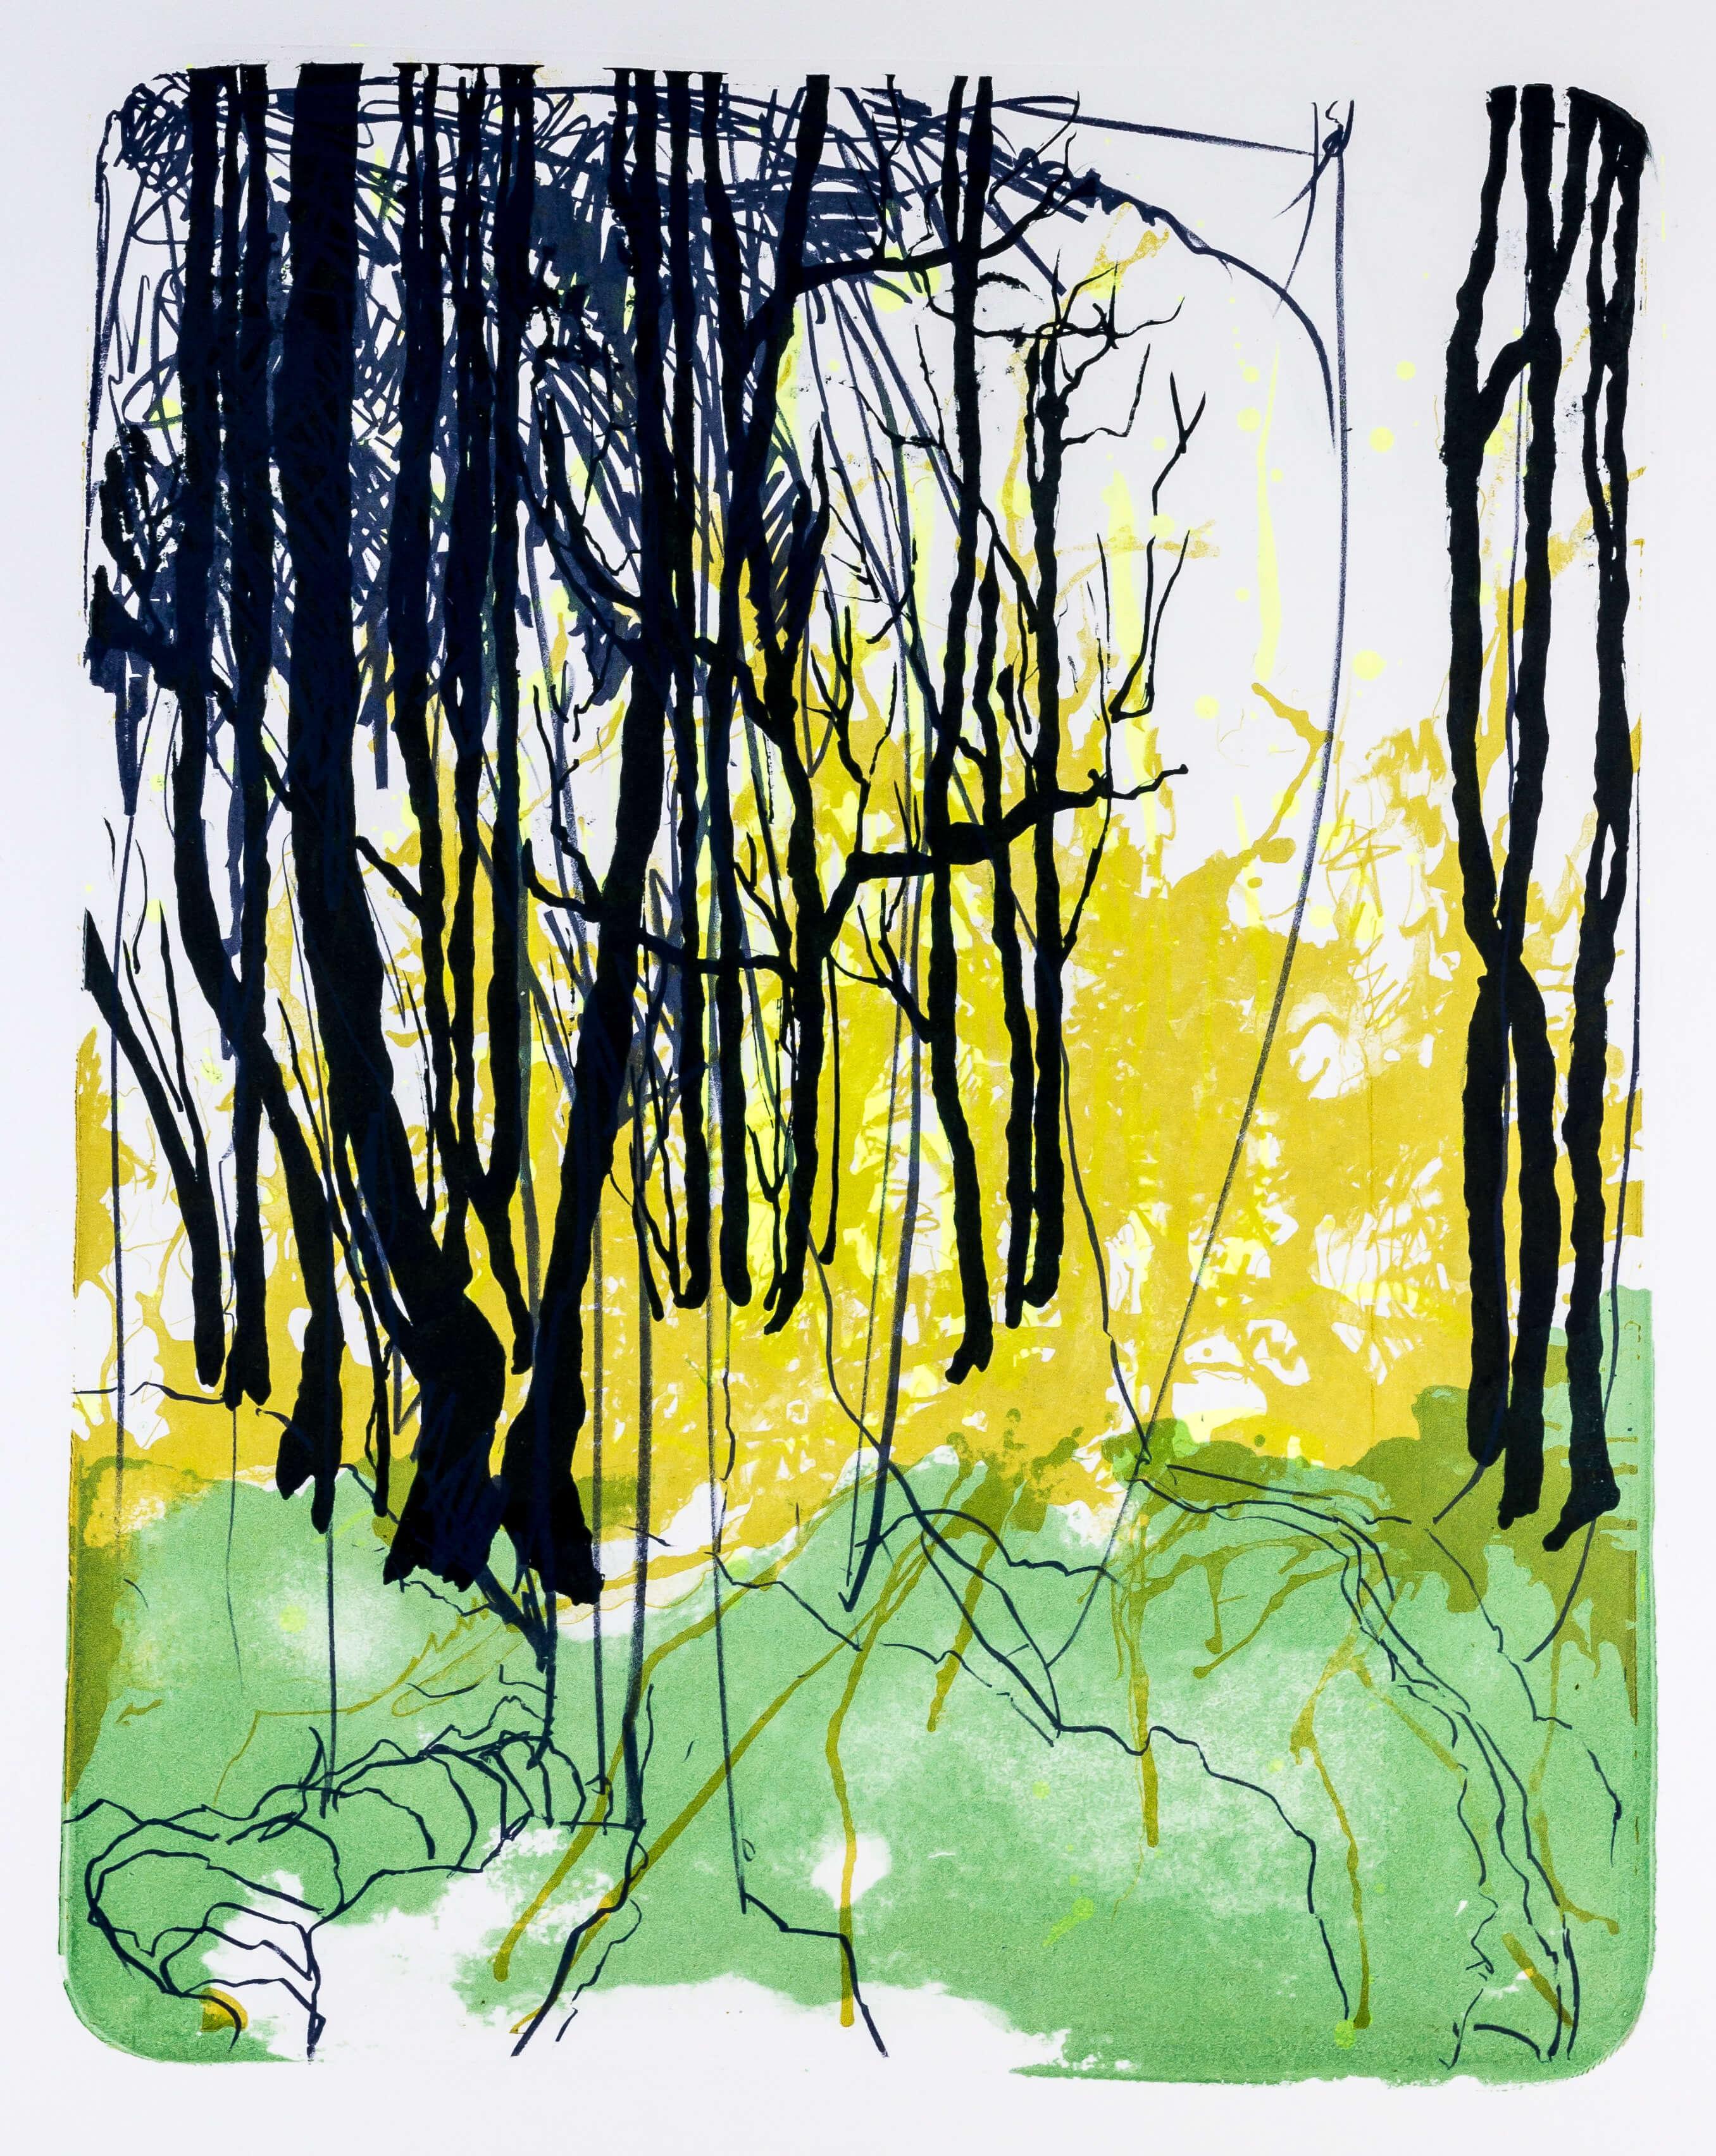 Katharina Albers, Wald X-XVI, 2015, Farblithographie, Unikat, 50×40 cm